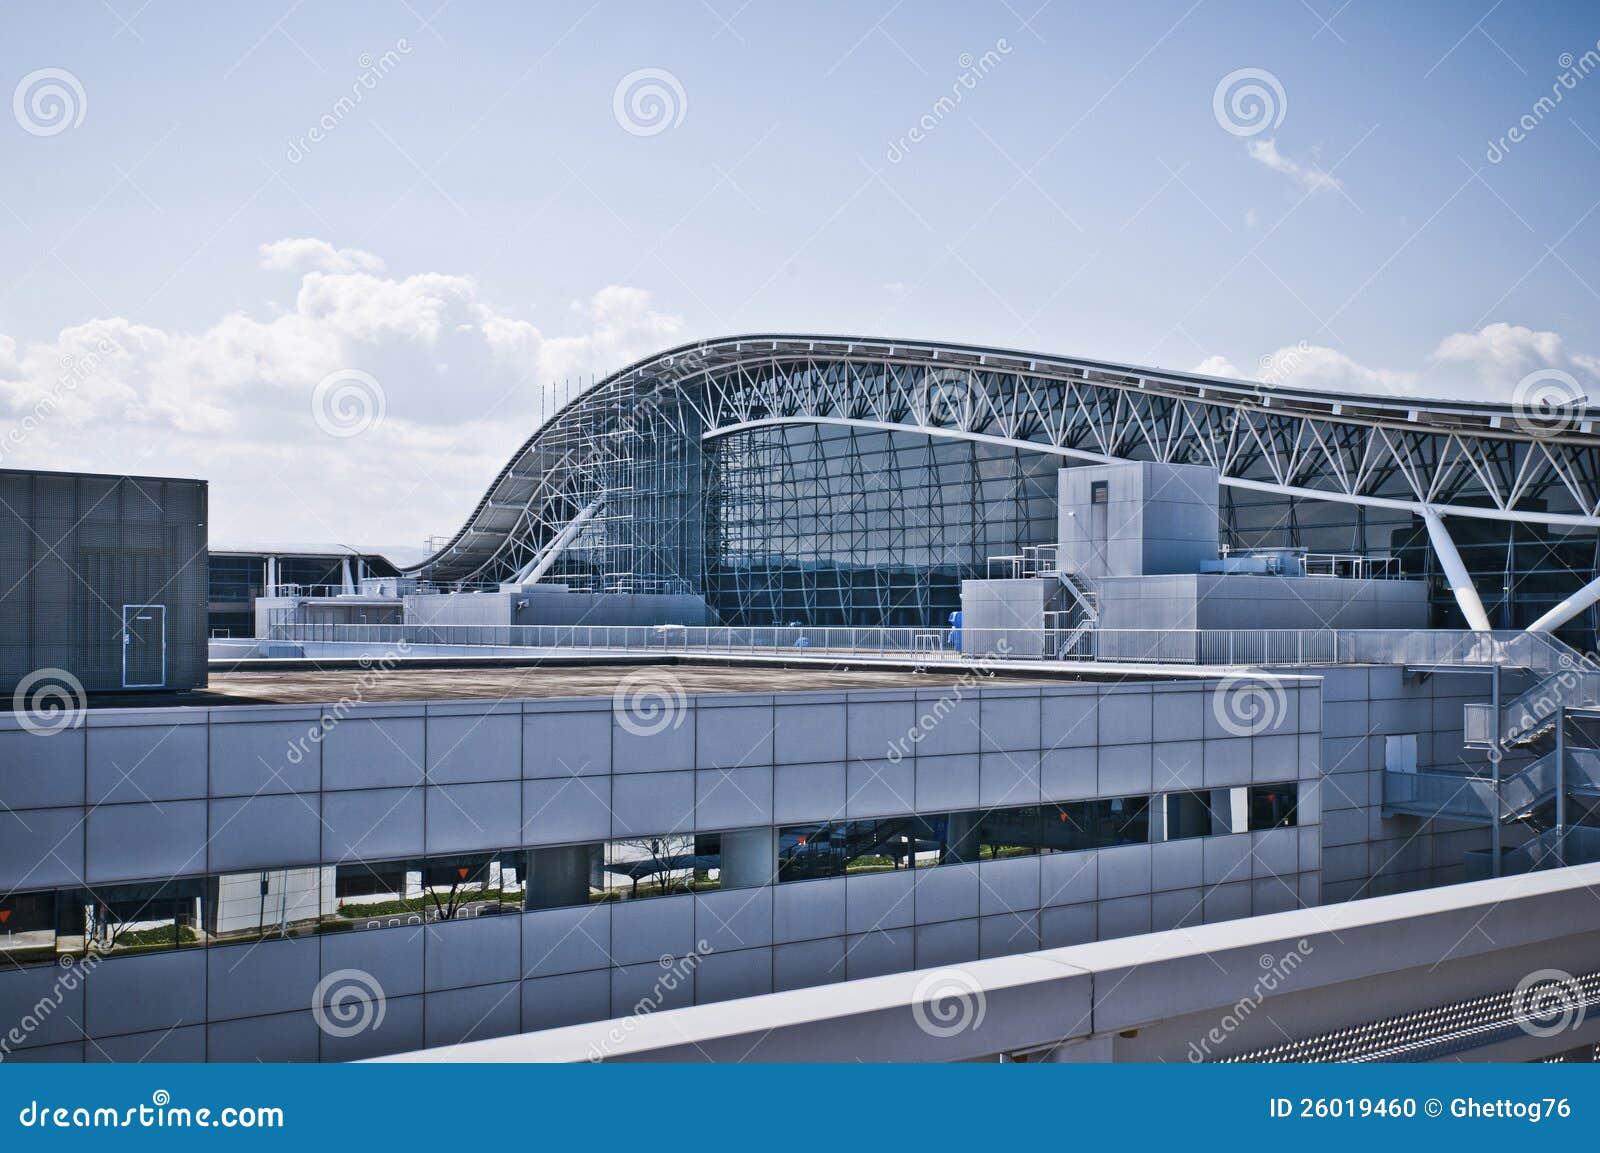 Aeroporto Kansai Osaka : Aeroporto internazionale del kansai fotografia stock